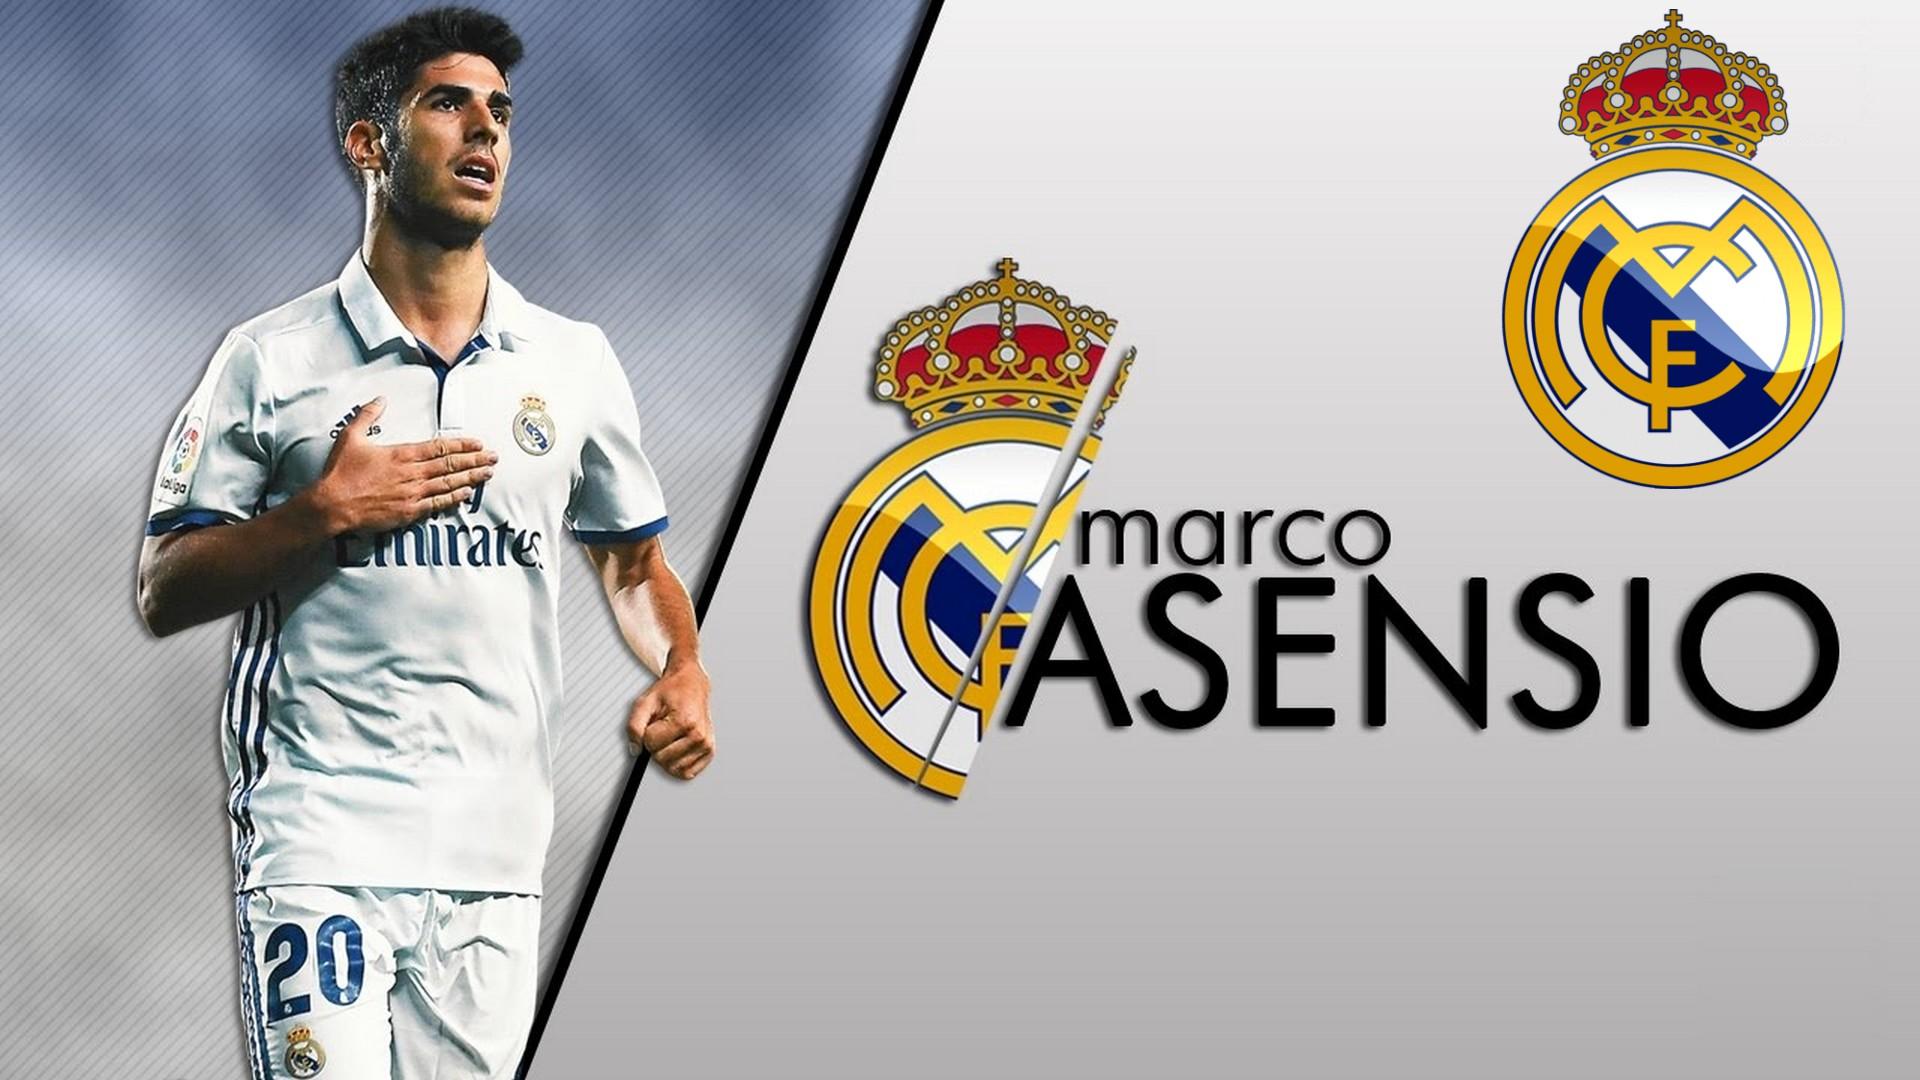 Whatsapp Wallpaper Android Hd Marco Asensio Real Madrid Wallpaper 2019 Football Wallpaper